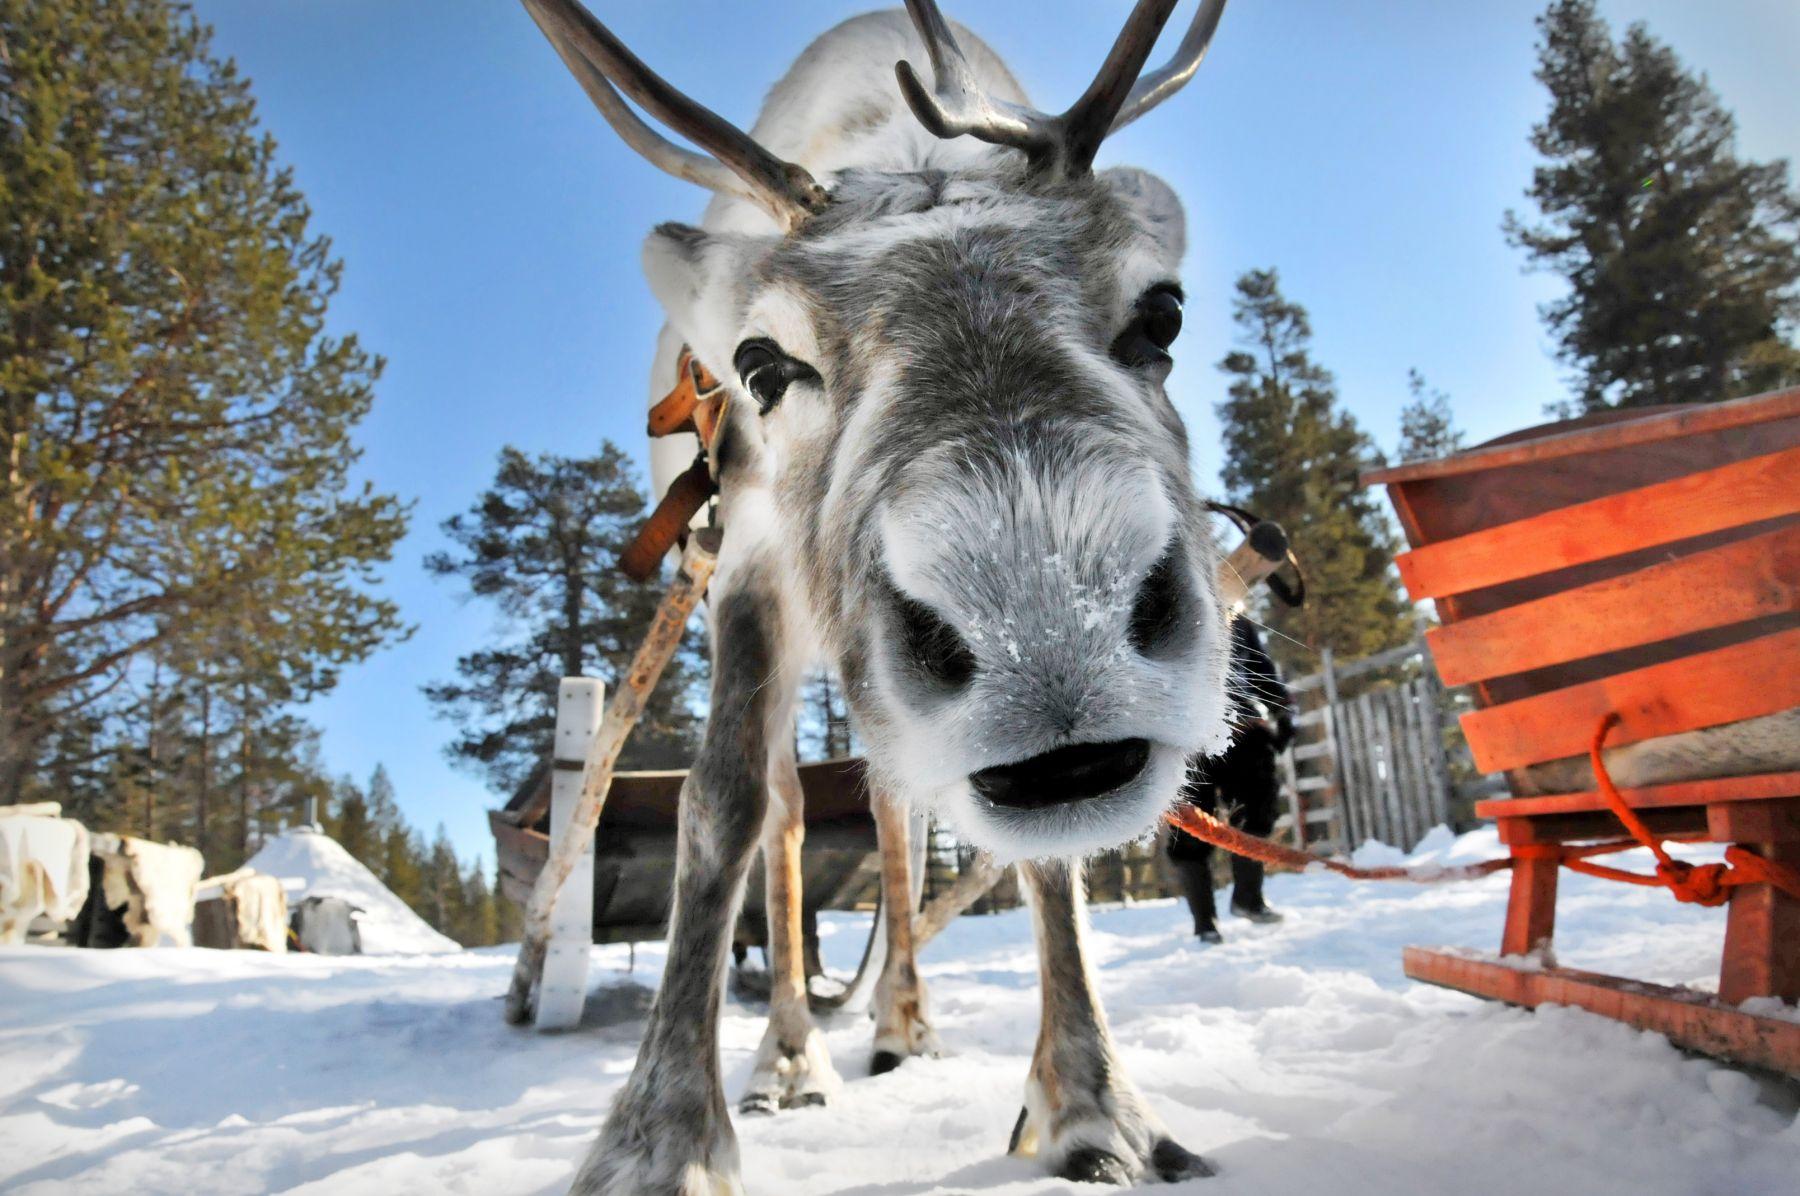 Тур в Лапландию к Санта Клаусу из Минска